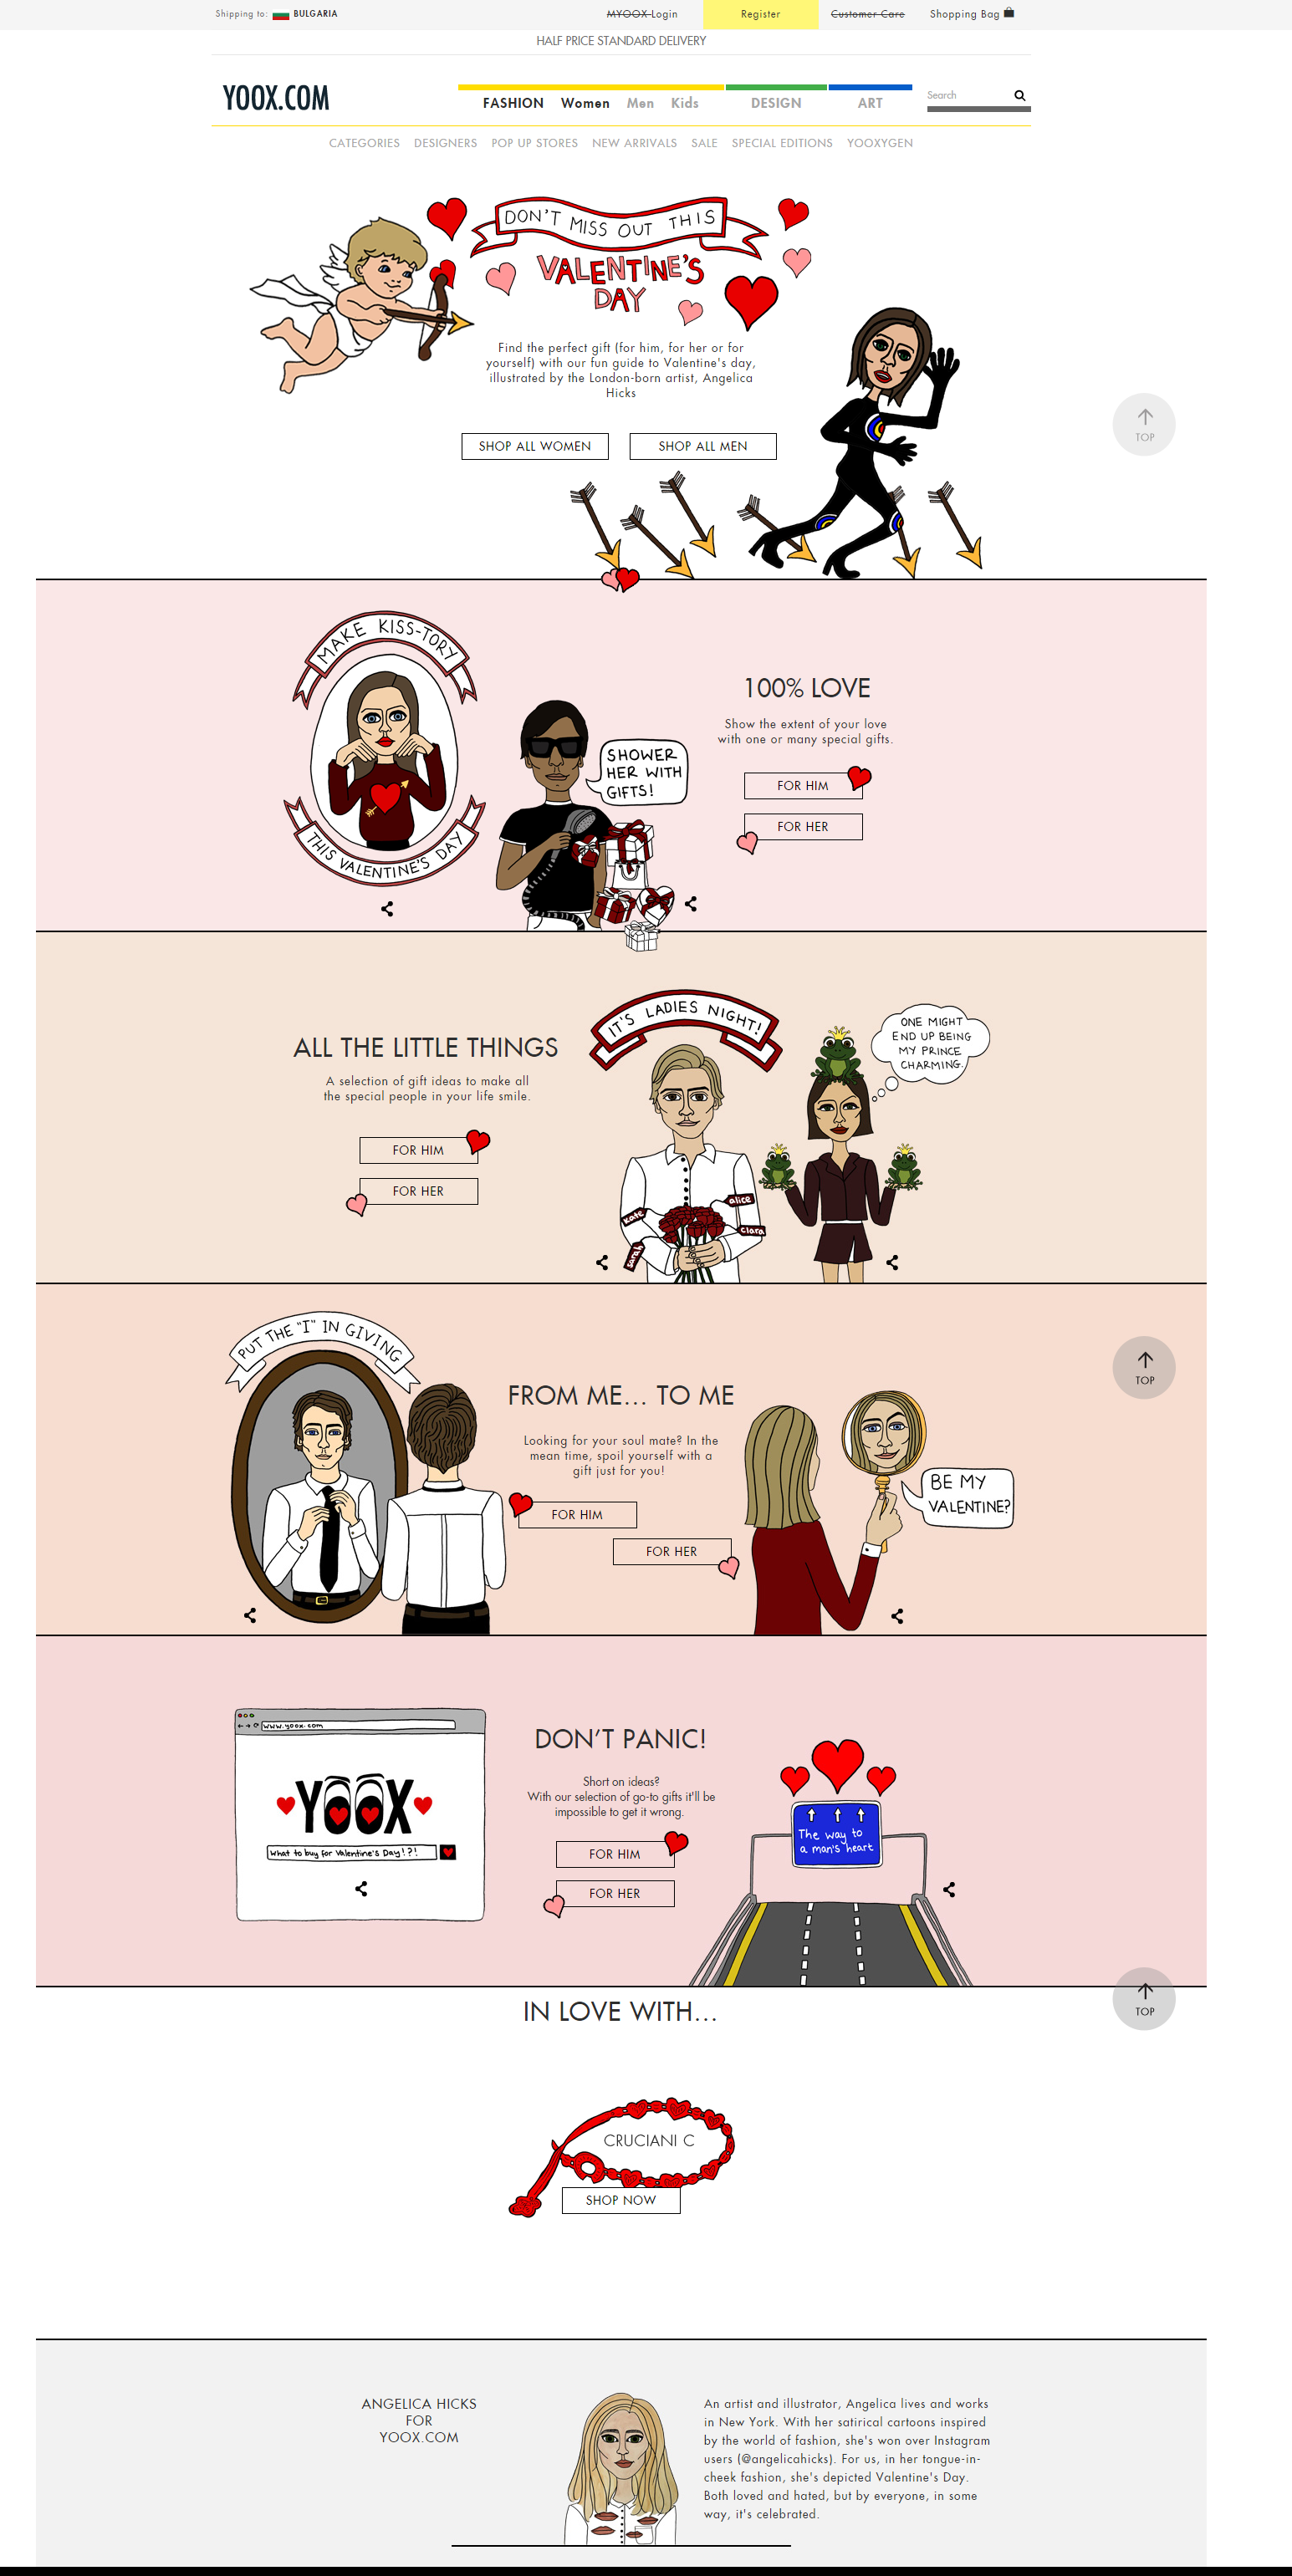 yoox-com-project-valentinesday